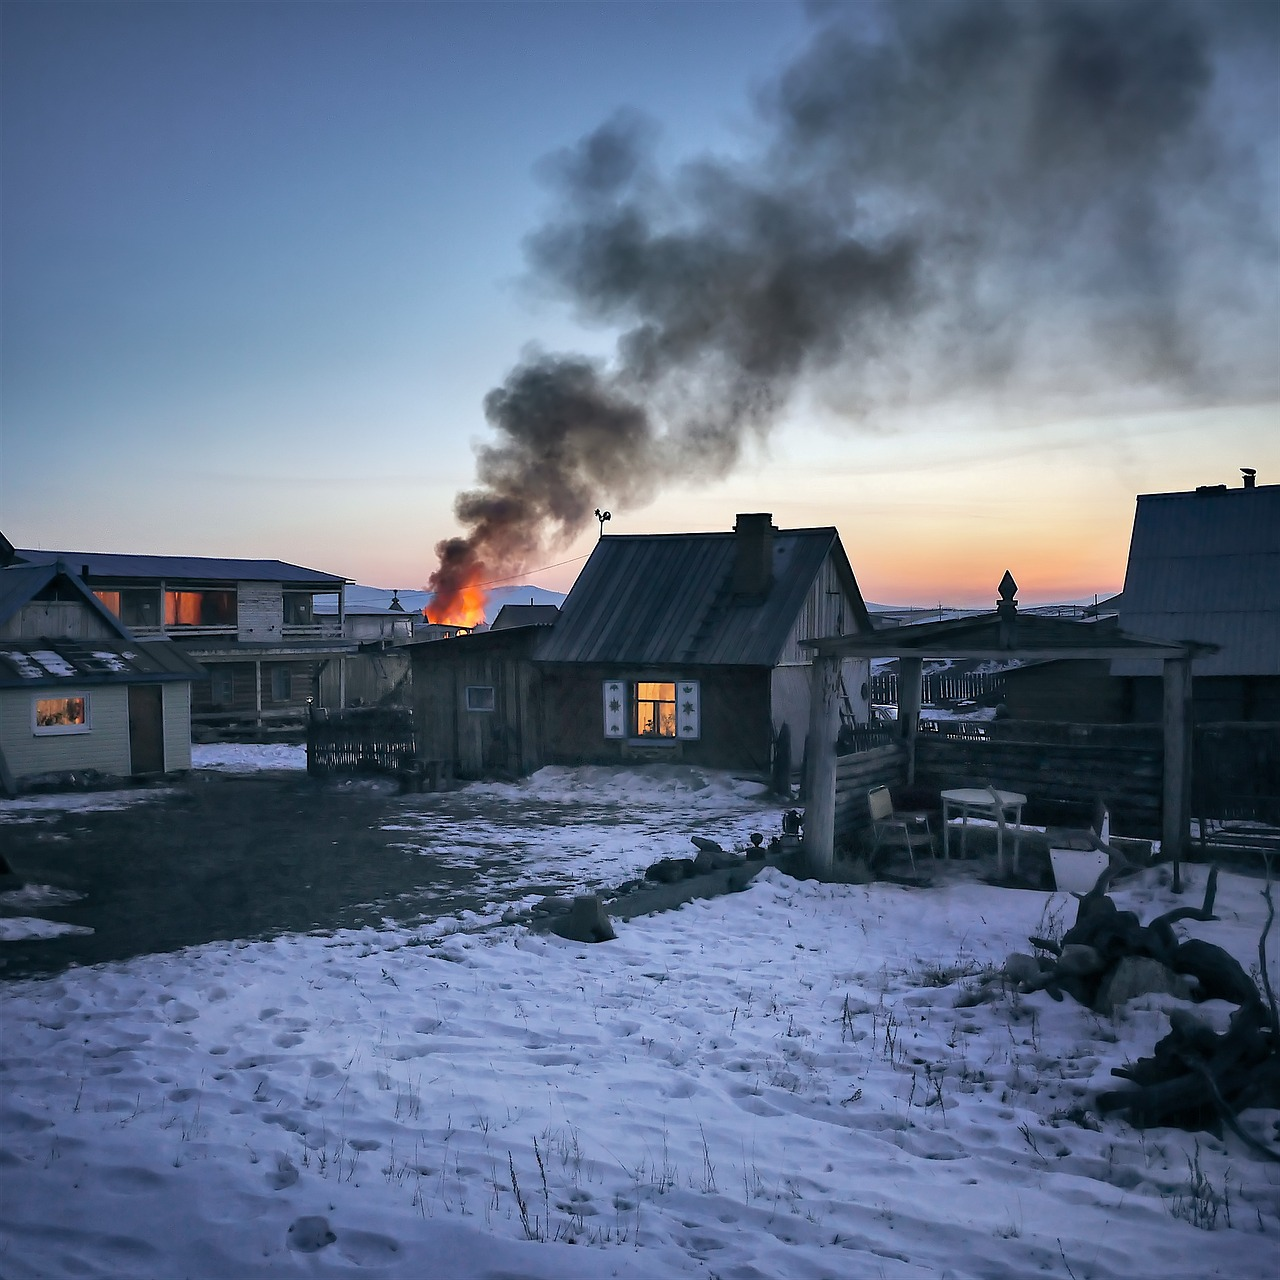 yakutsk paese più freddo del mondo